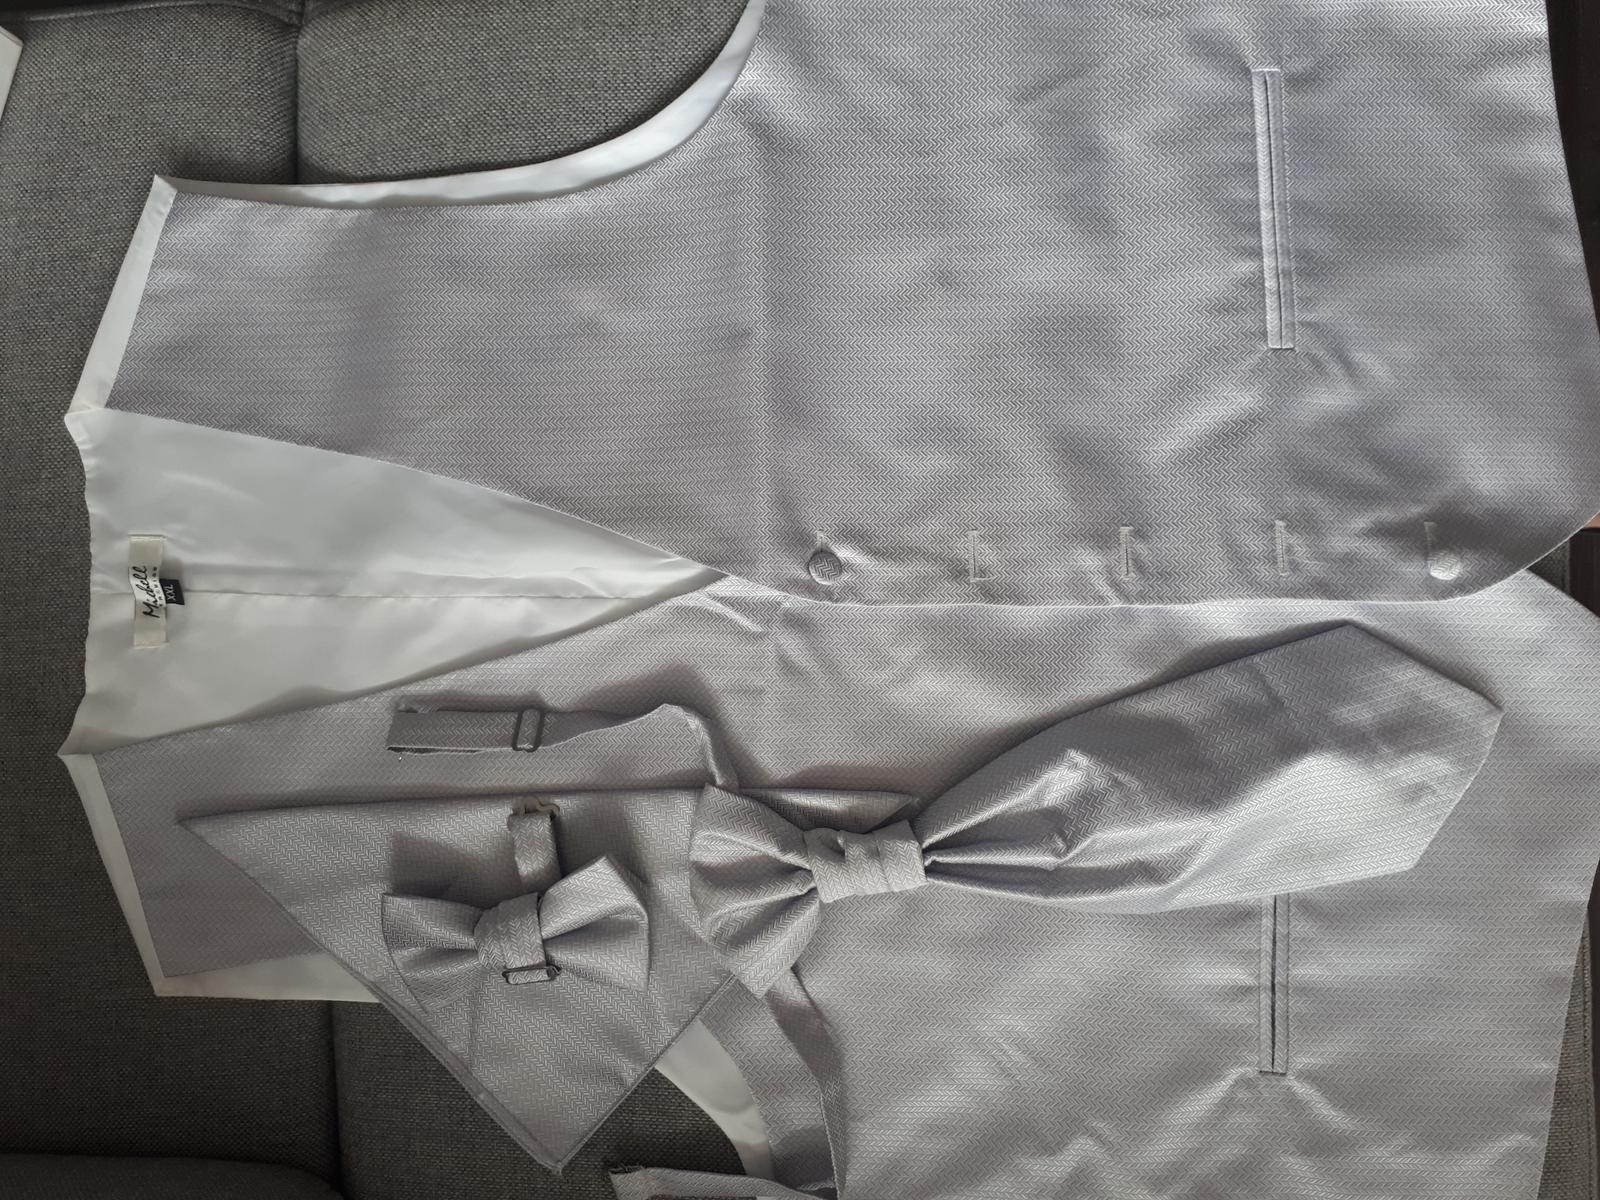 Panska vesta 2XL + kravata + motylik + vreckovka - Obrázok č. 2